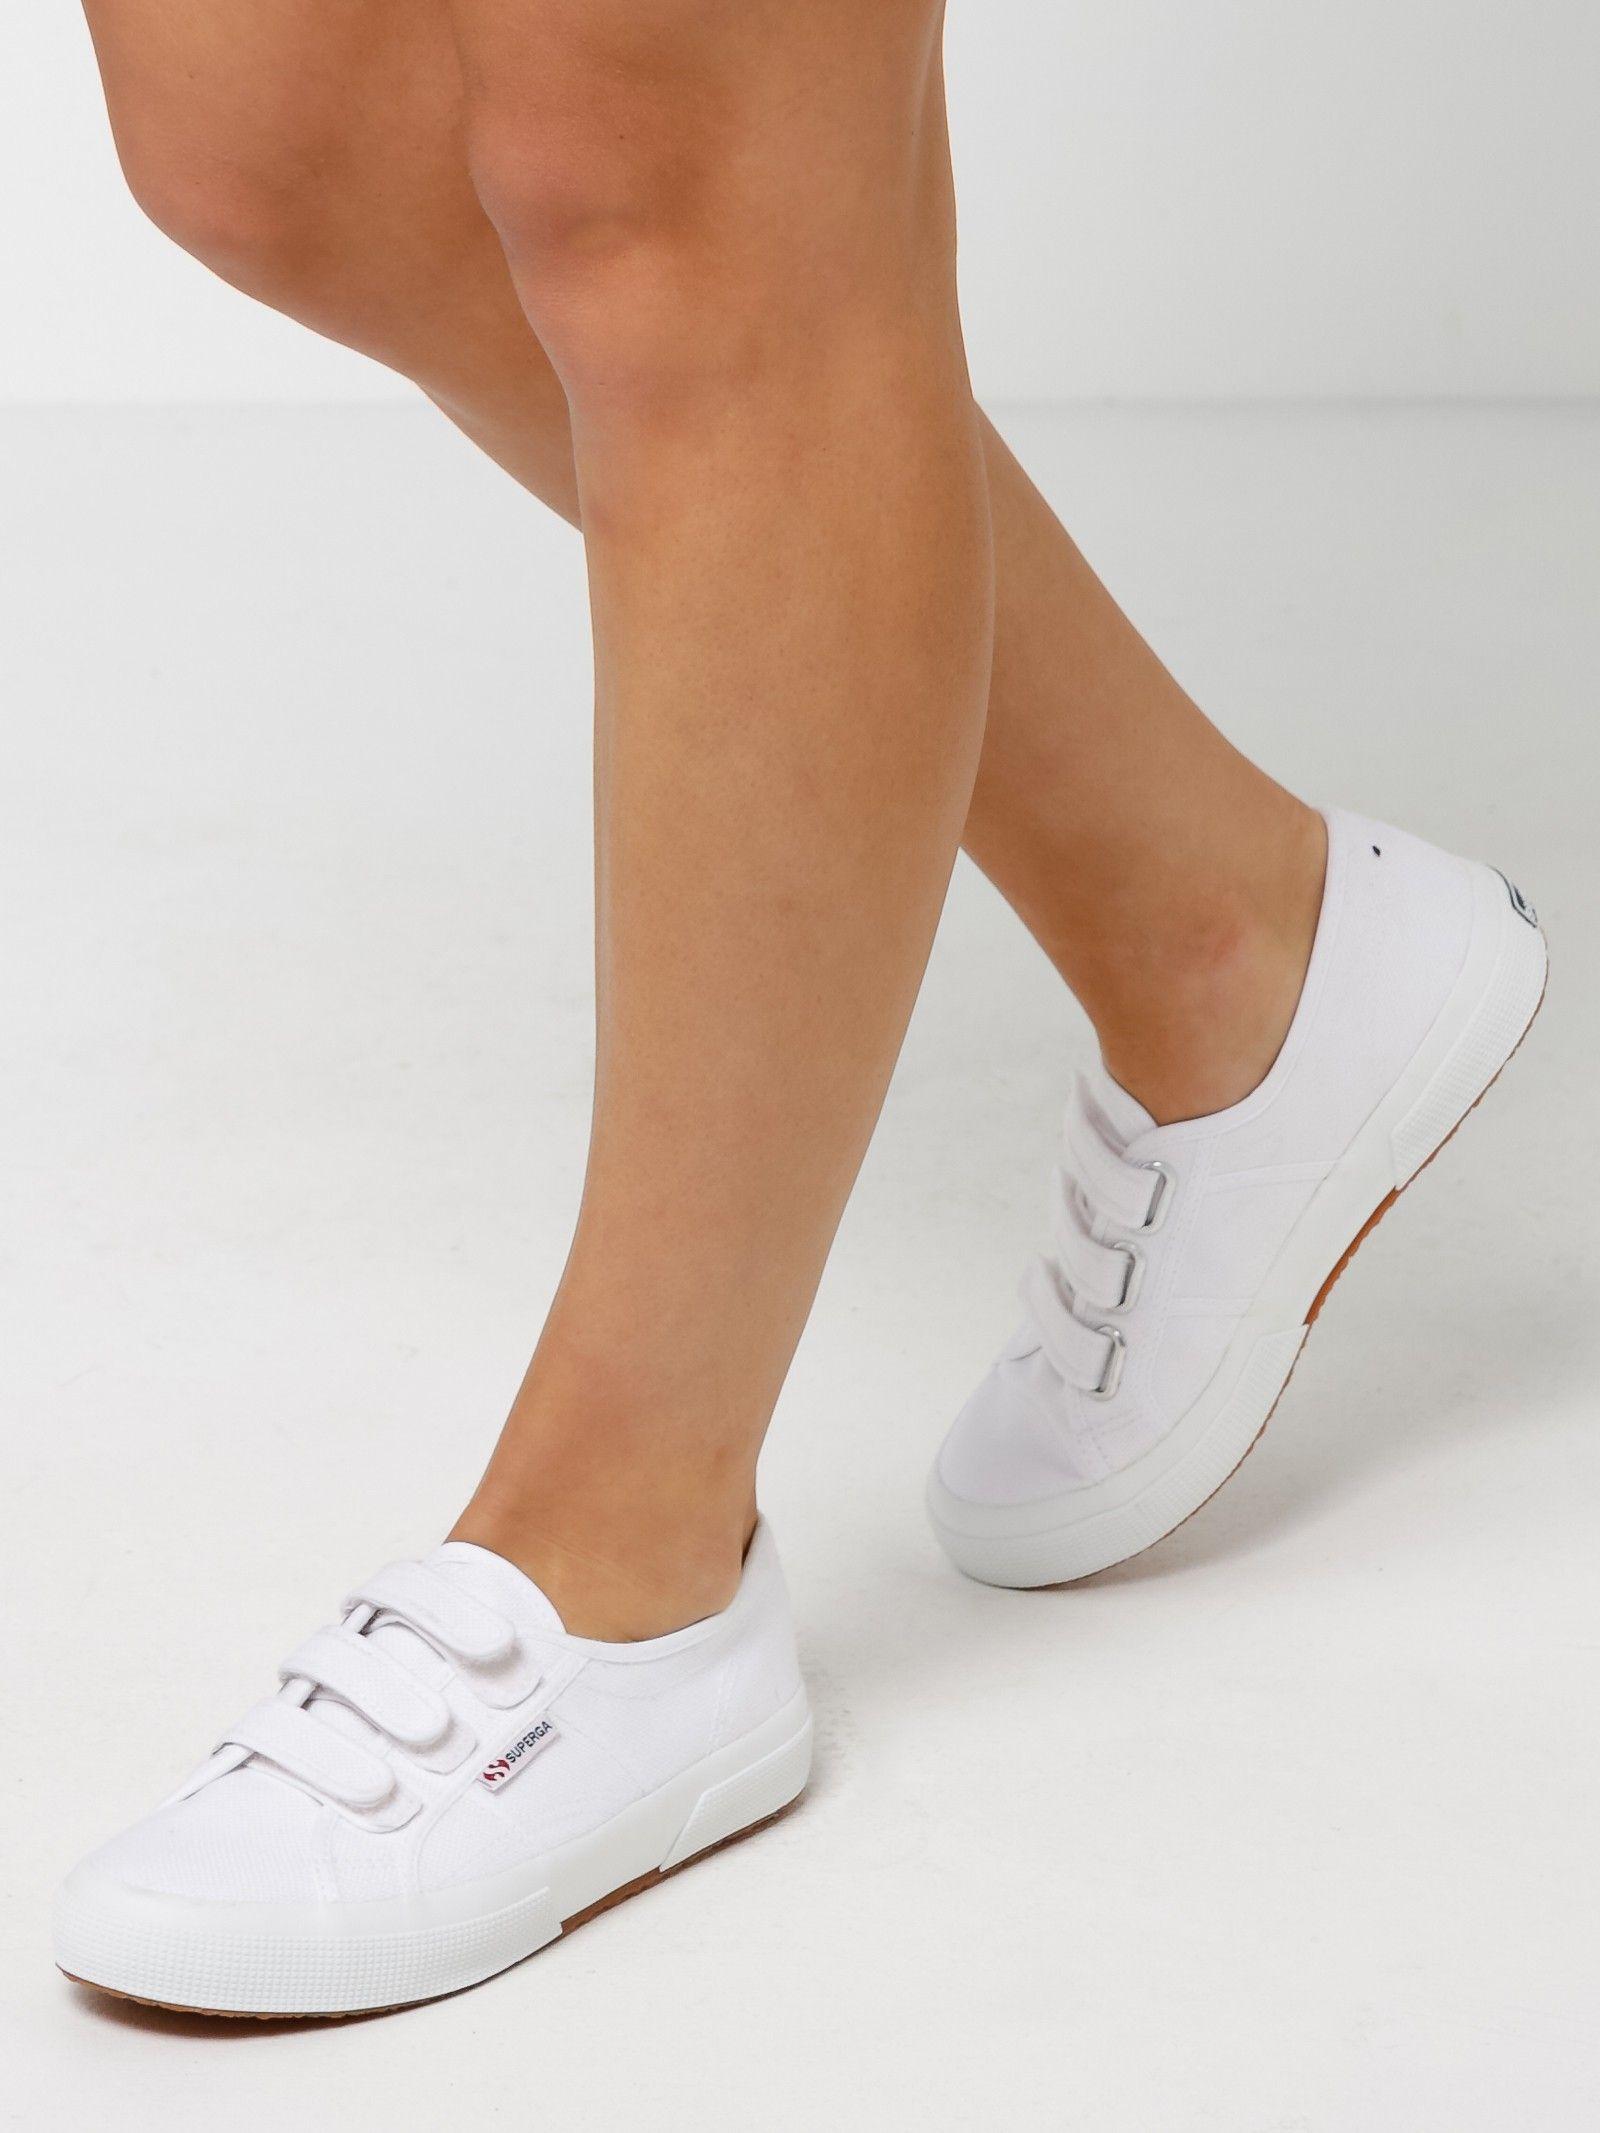 Unisex 2750 Cotu 2 Velcro Strap Sneaker